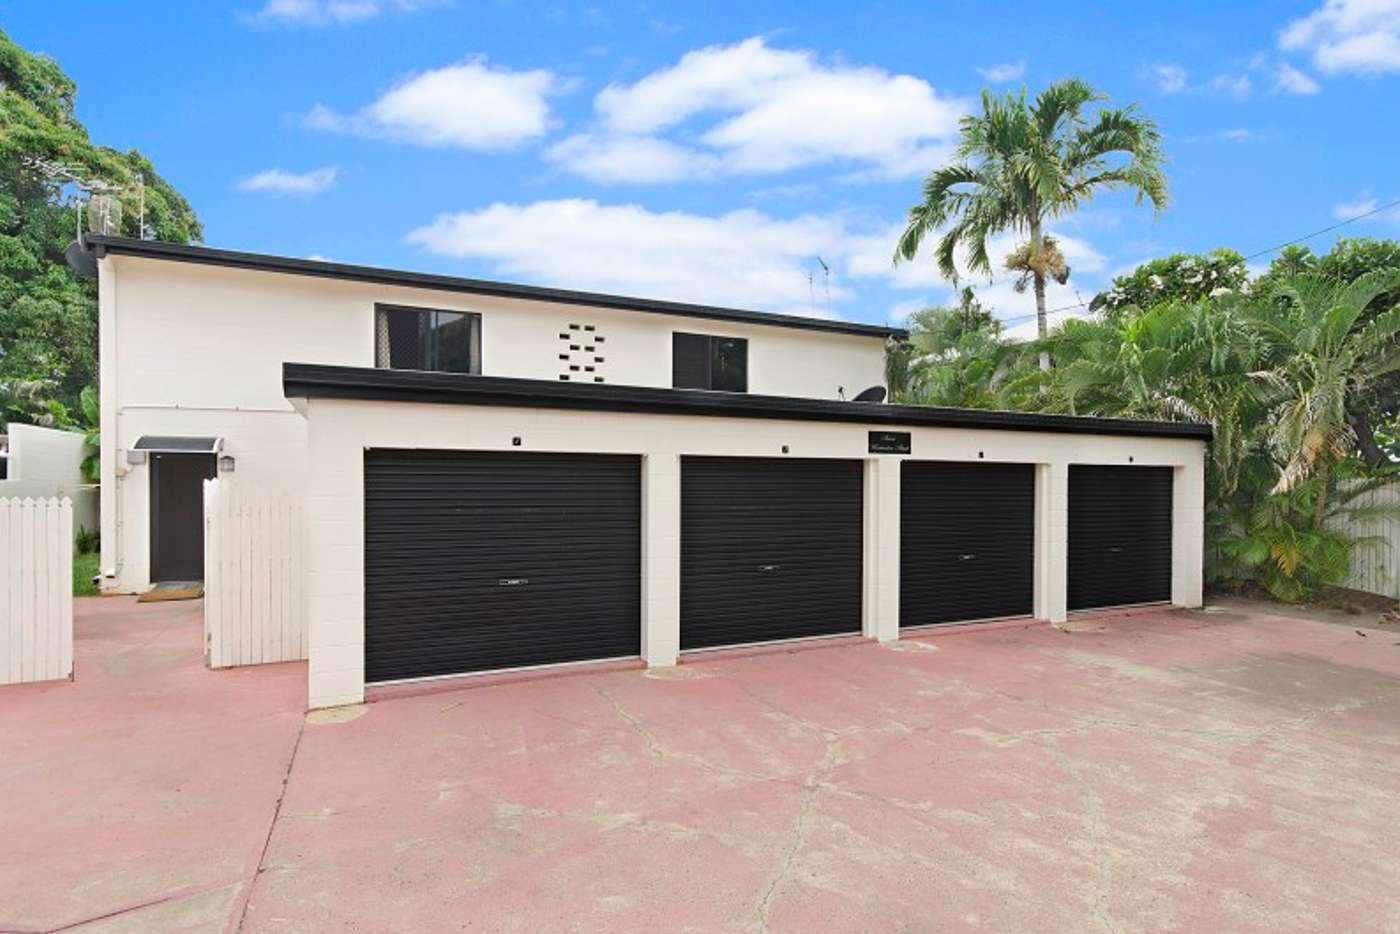 Main view of Homely unit listing, 1/7 Warburton Street, North Ward QLD 4810